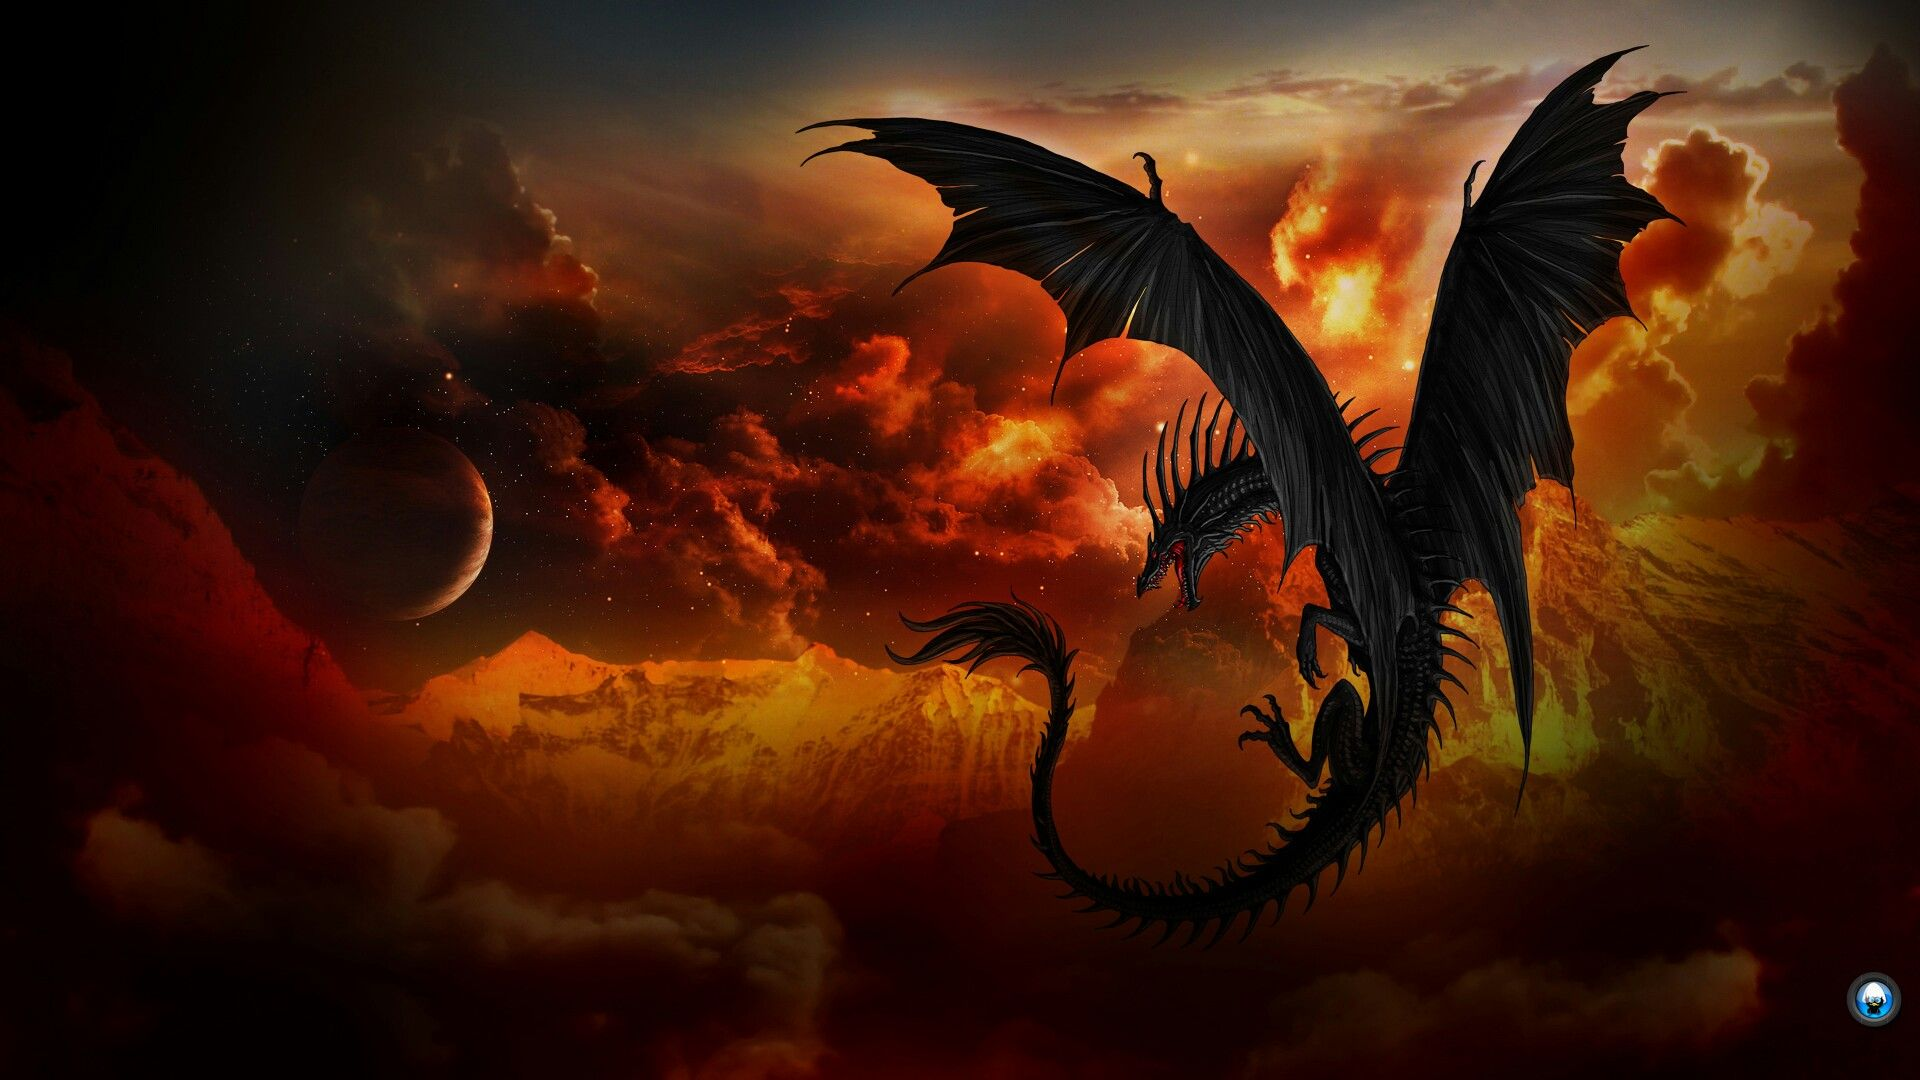 Dragon Hd Wallpaper 1920x1080 2020 Live Wallpaper Hd Dragon Pictures Dragon Images Dragon Art